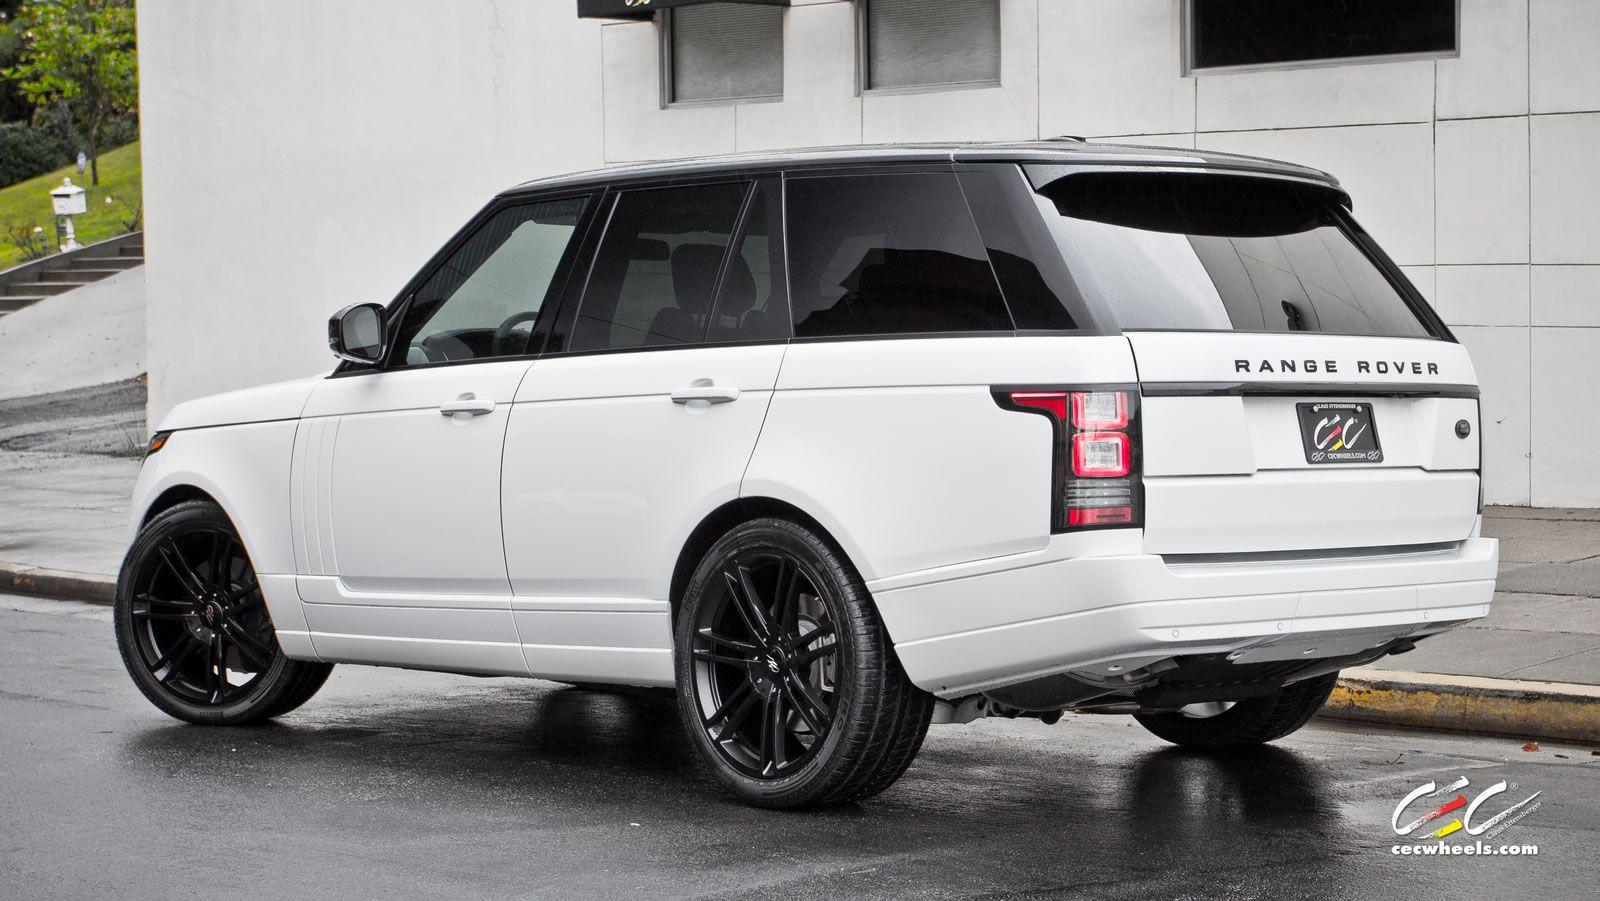 Matte White Land Rover >> Matte White Range Rover 2013 Google Search Cars Range Rover